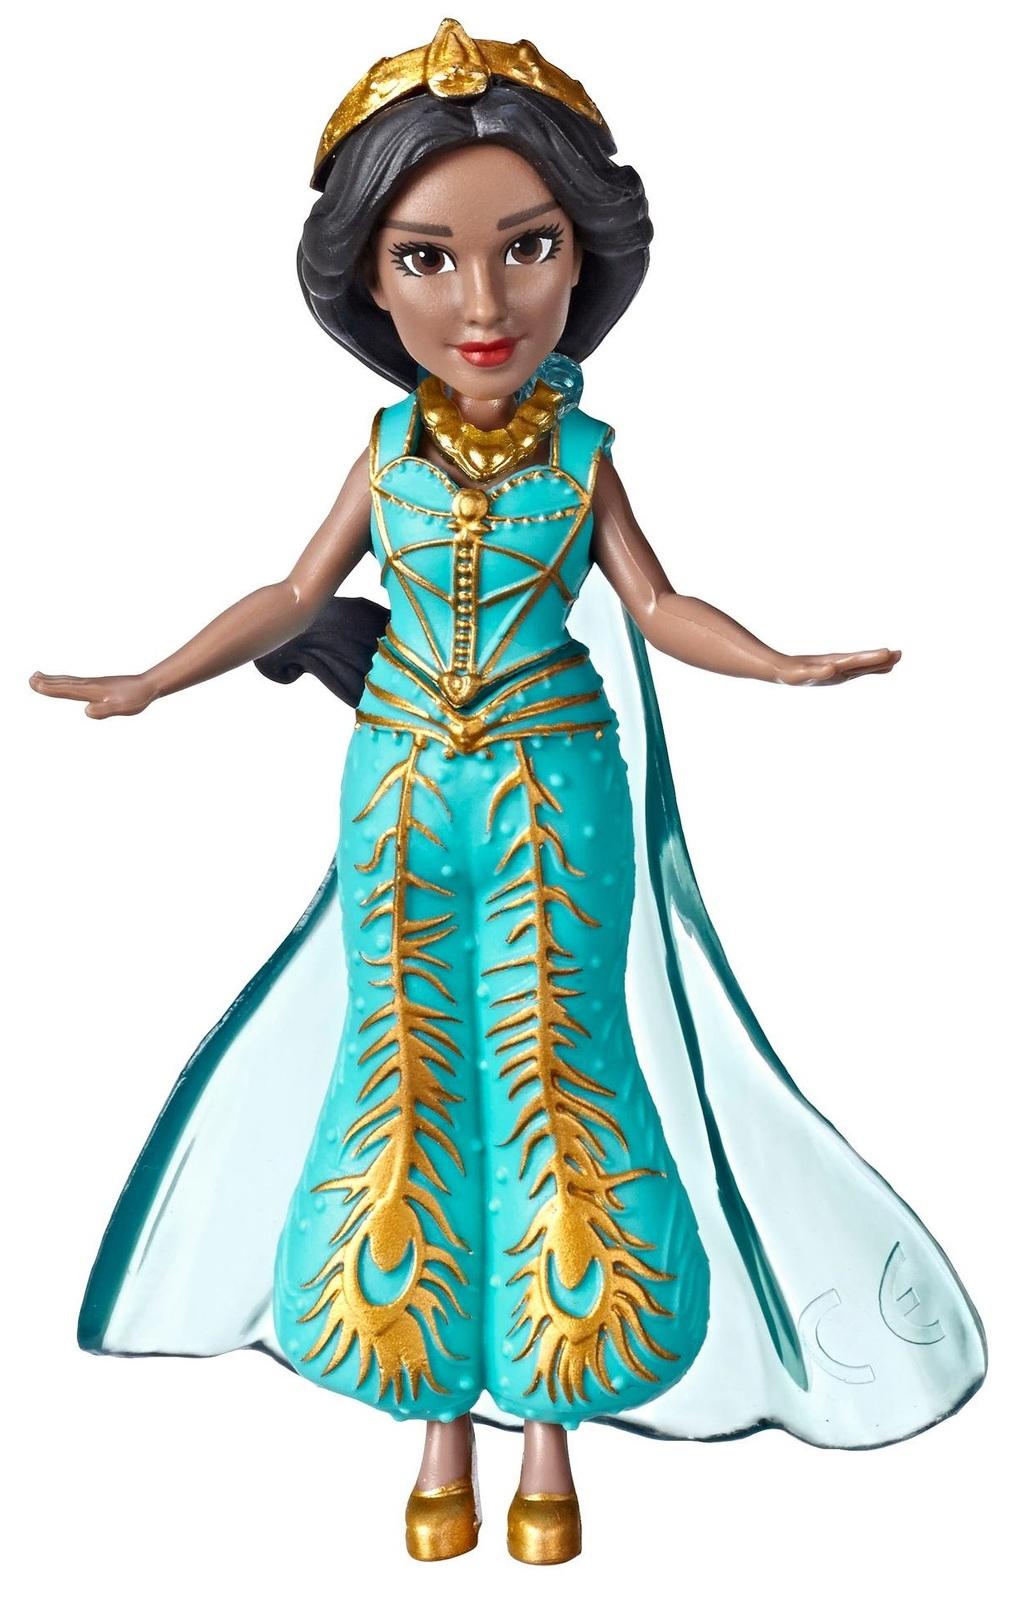 Disney's Aladdin: Small Character Doll - Jasmine image